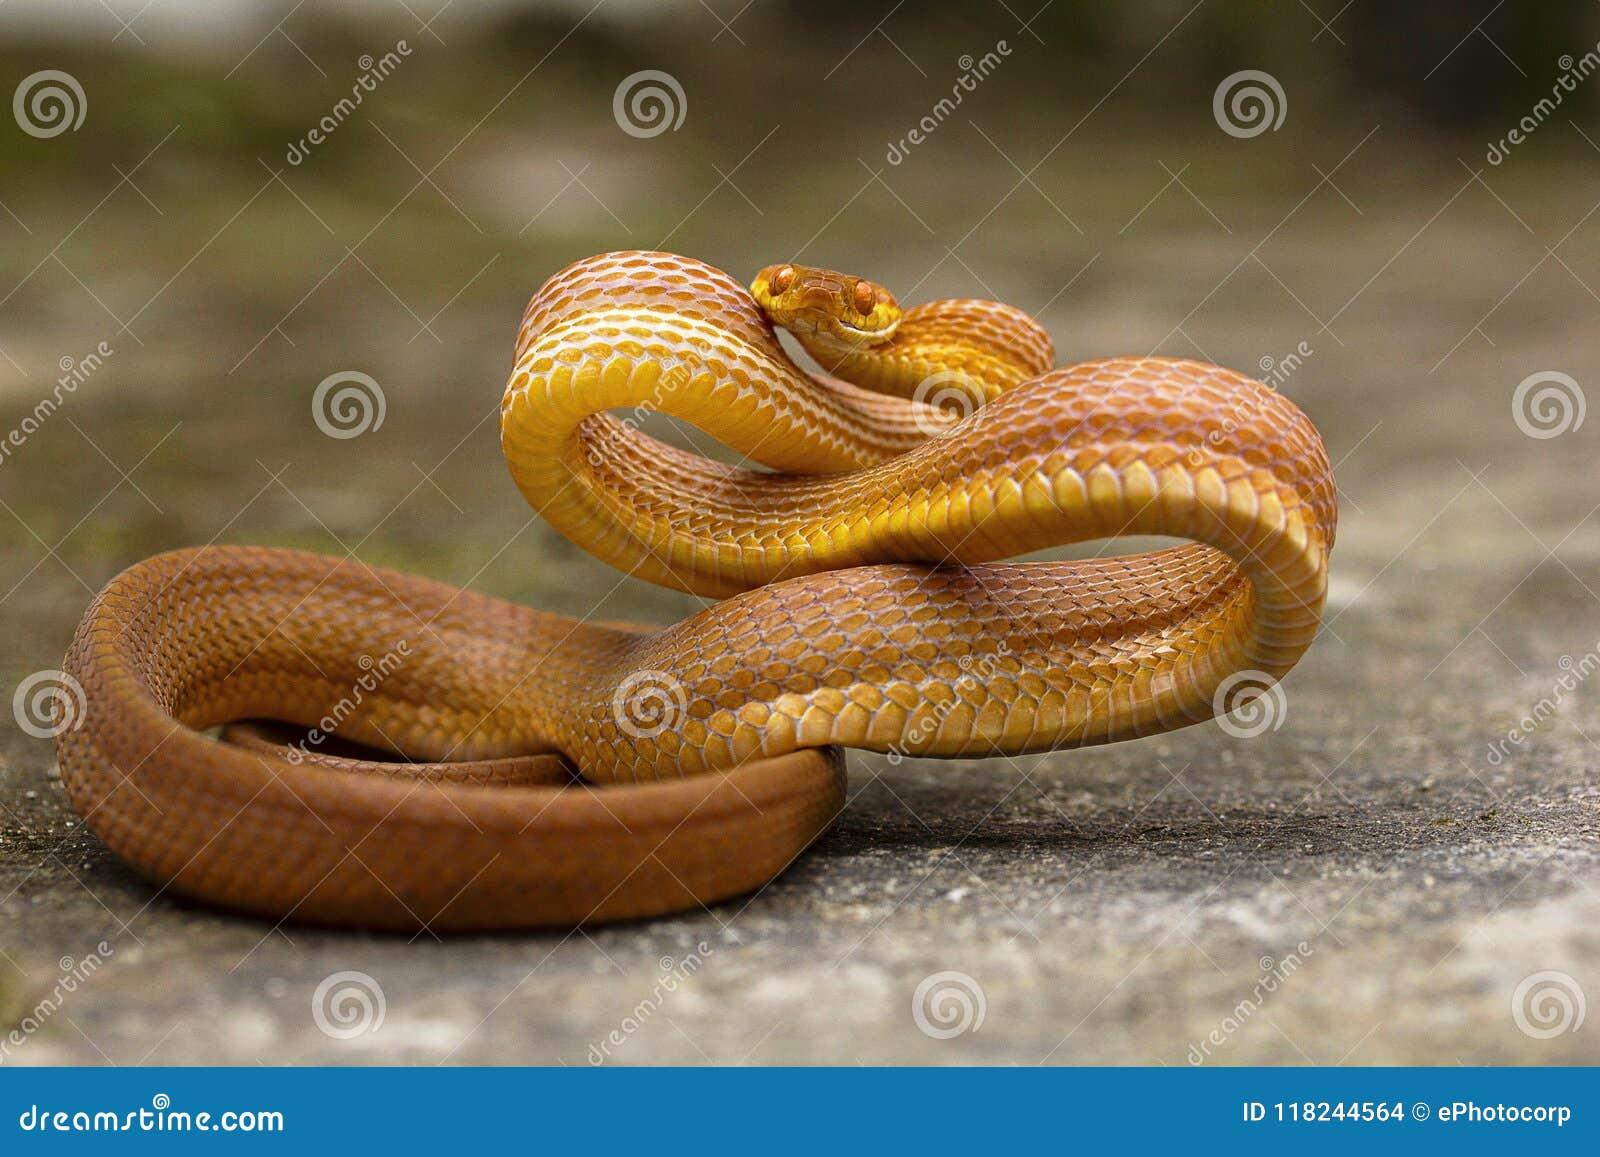 Tawny cat snake, Boiga ochracea, Colubridae, Gumti, Tripura , India